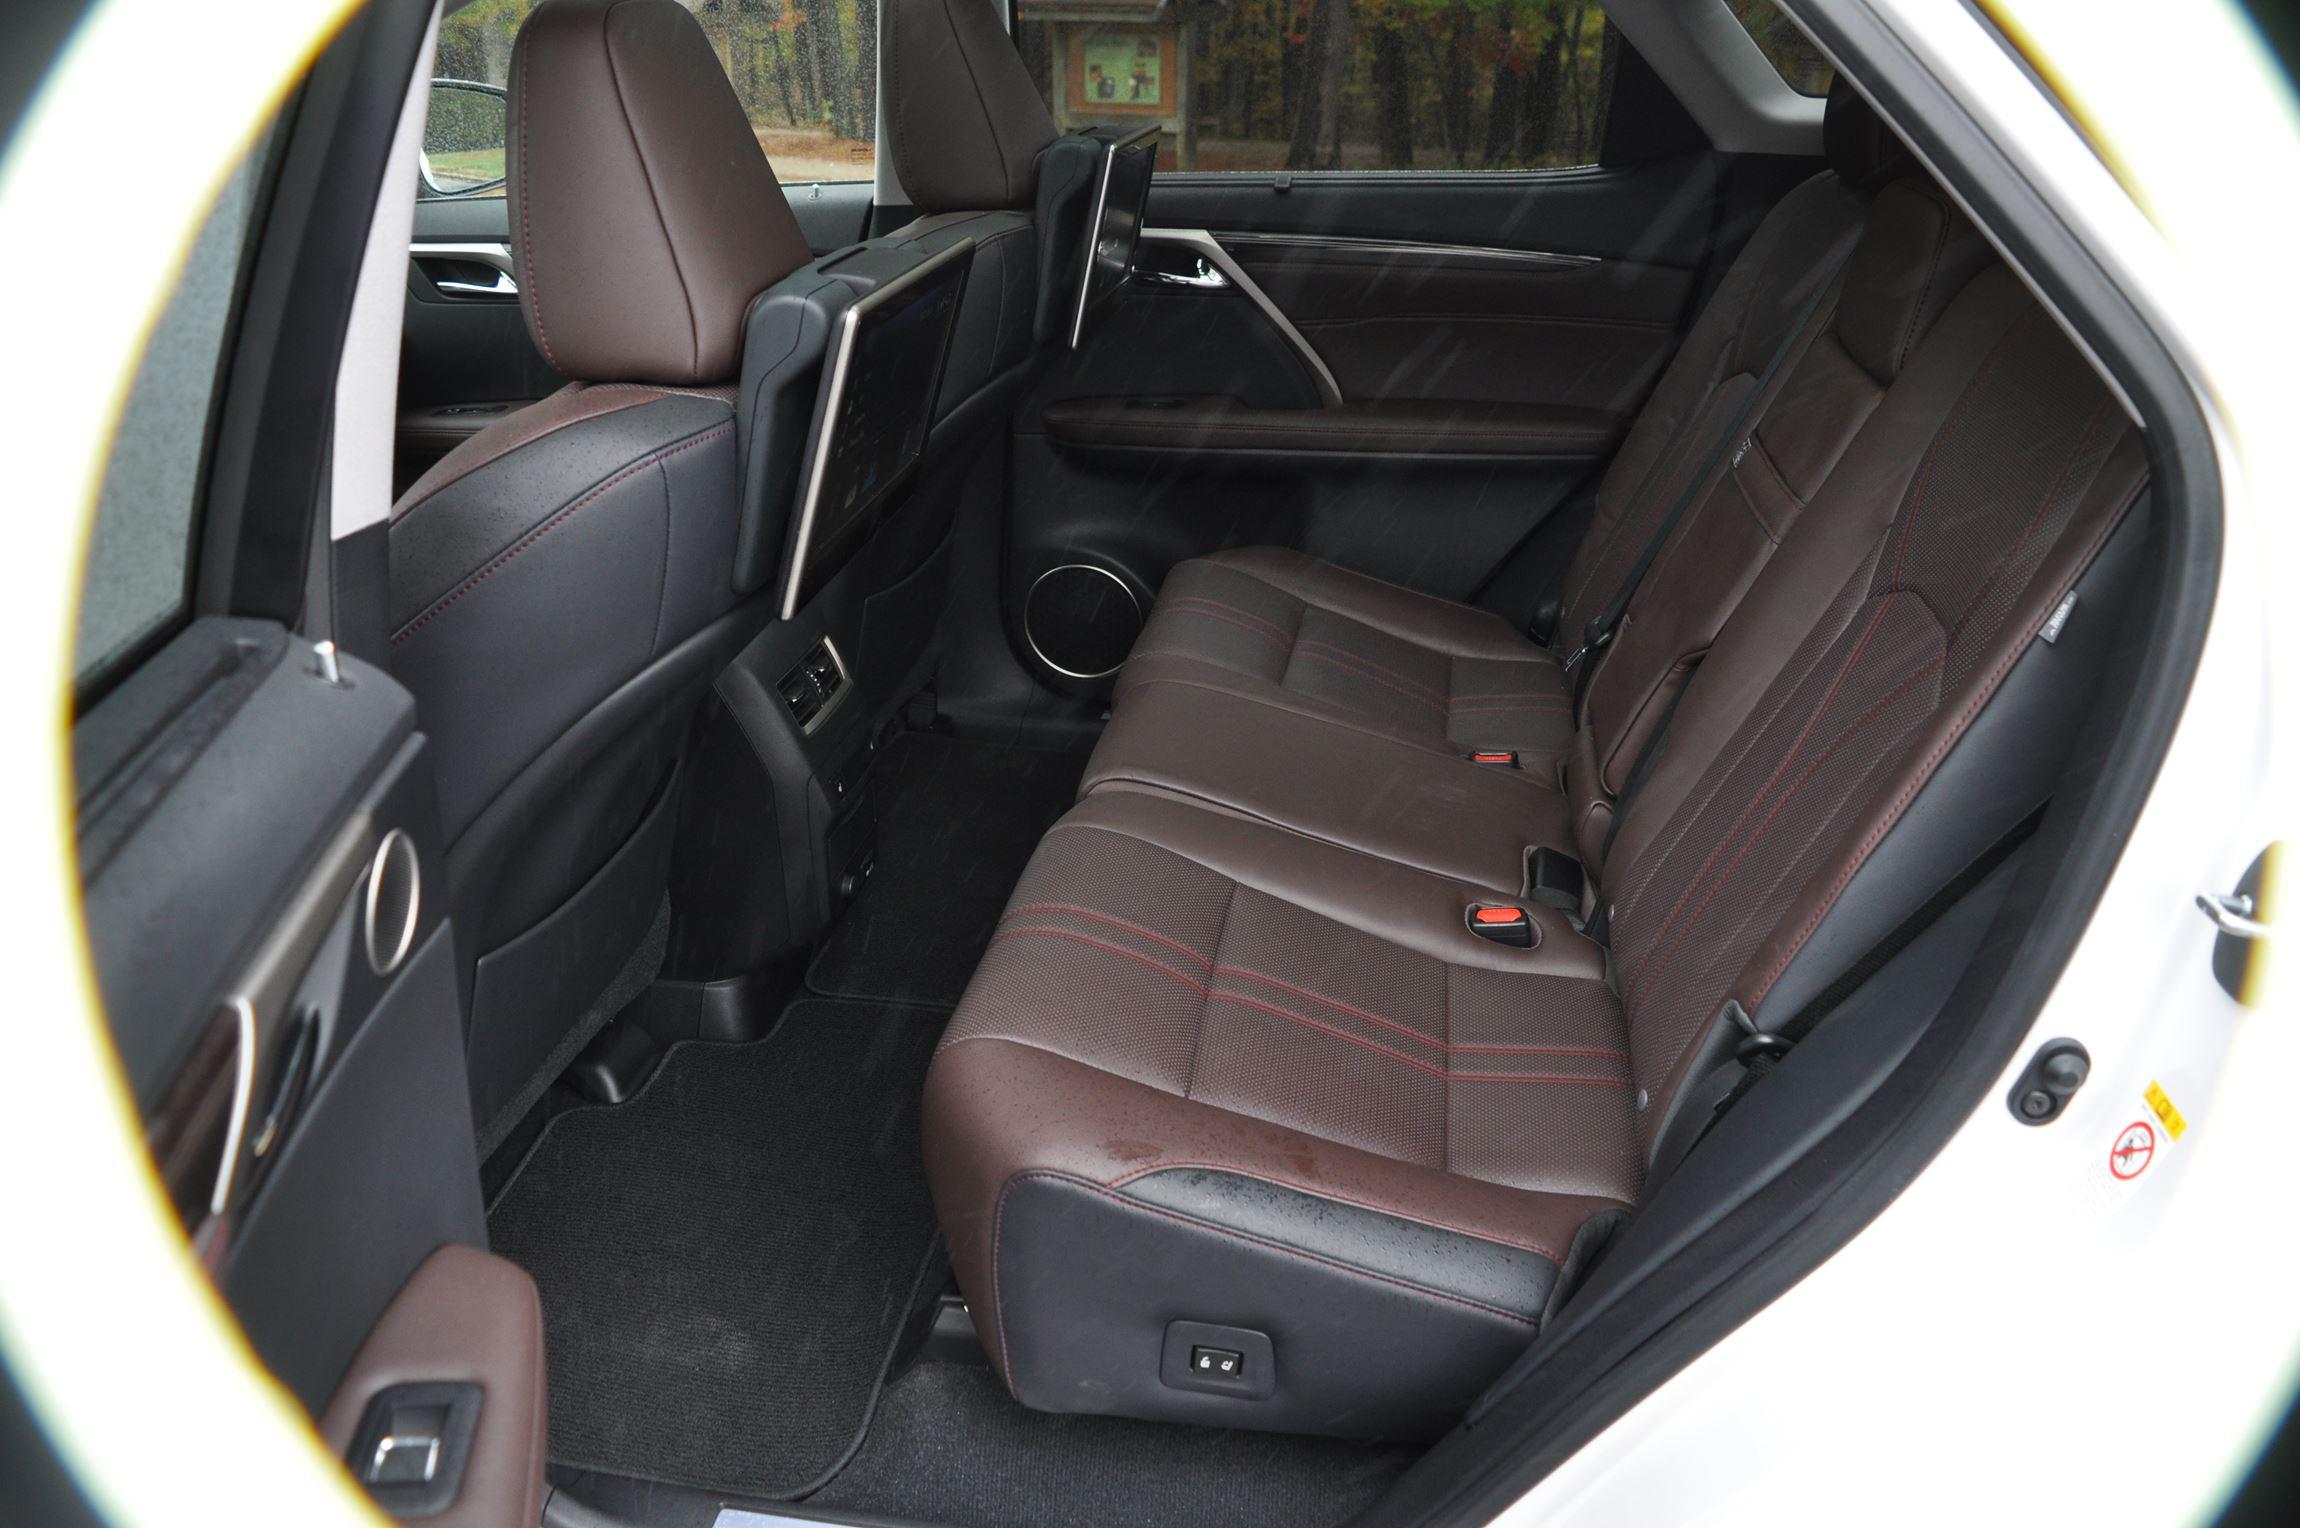 HD Road Test Review - 2016 Lexus RX450h F Sport AWD - A ...